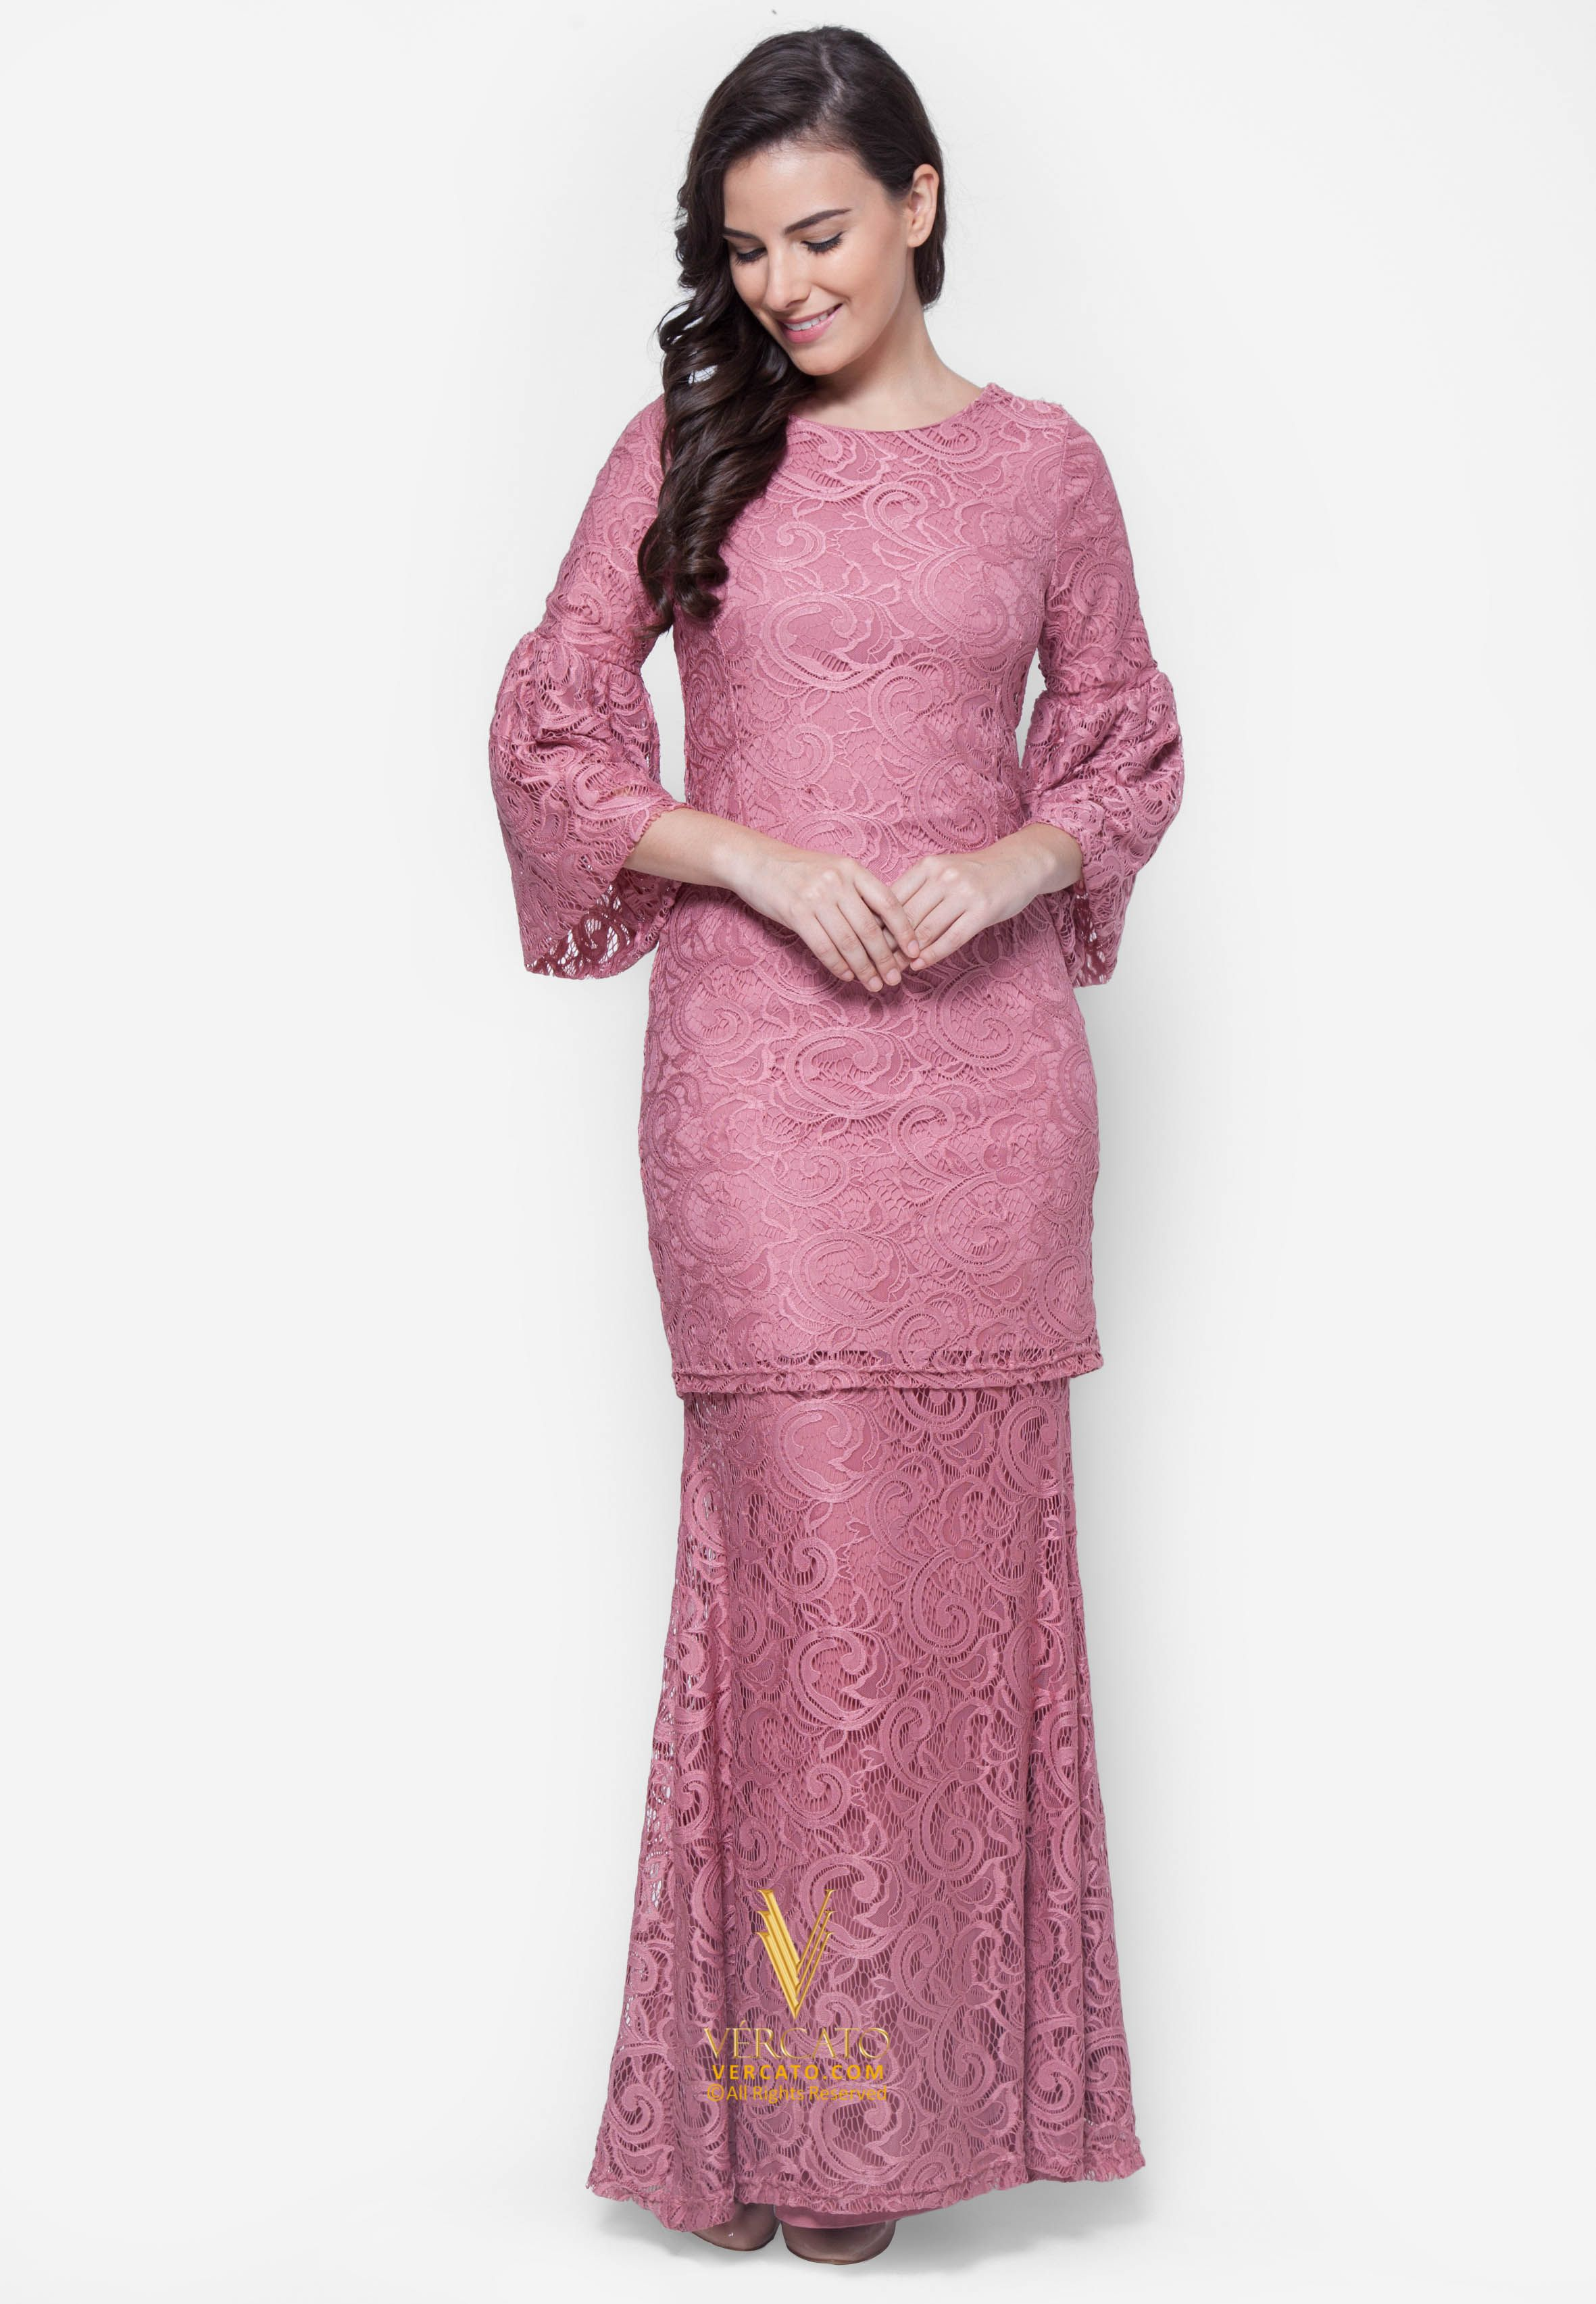 Baju Kurung Moden Lace Vercato Nora In Dusty Pink Buy Simple And Elegance Flare Sleeve Lace Baju Kur Model Pakaian Muslim Pakaian Wanita Model Pakaian Hijab